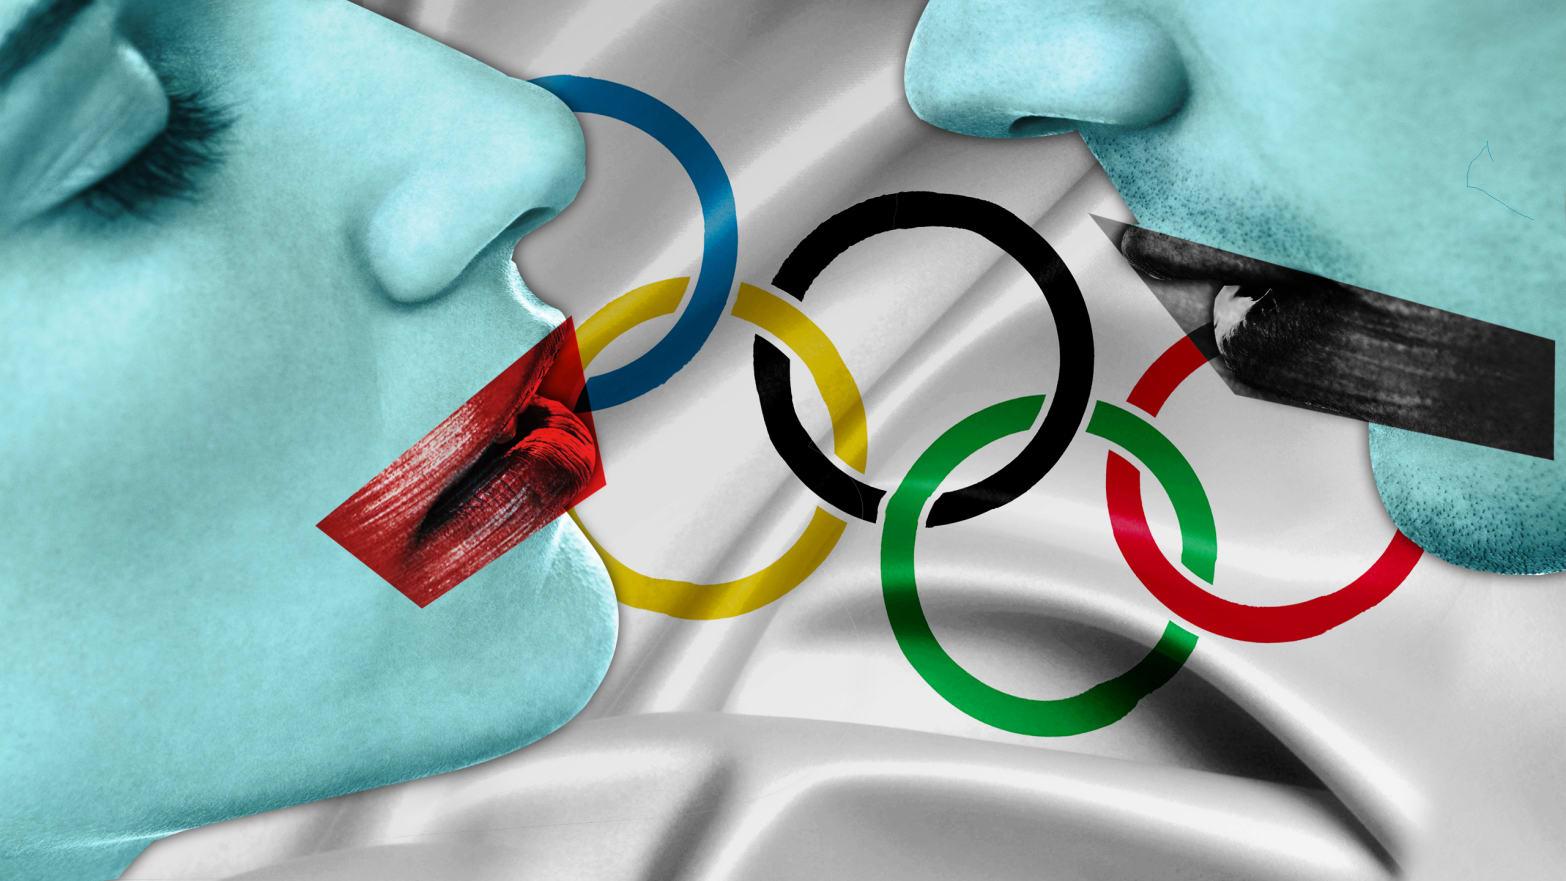 sex abstain olympics pyeongchang athlete testosterone sperm men women strength